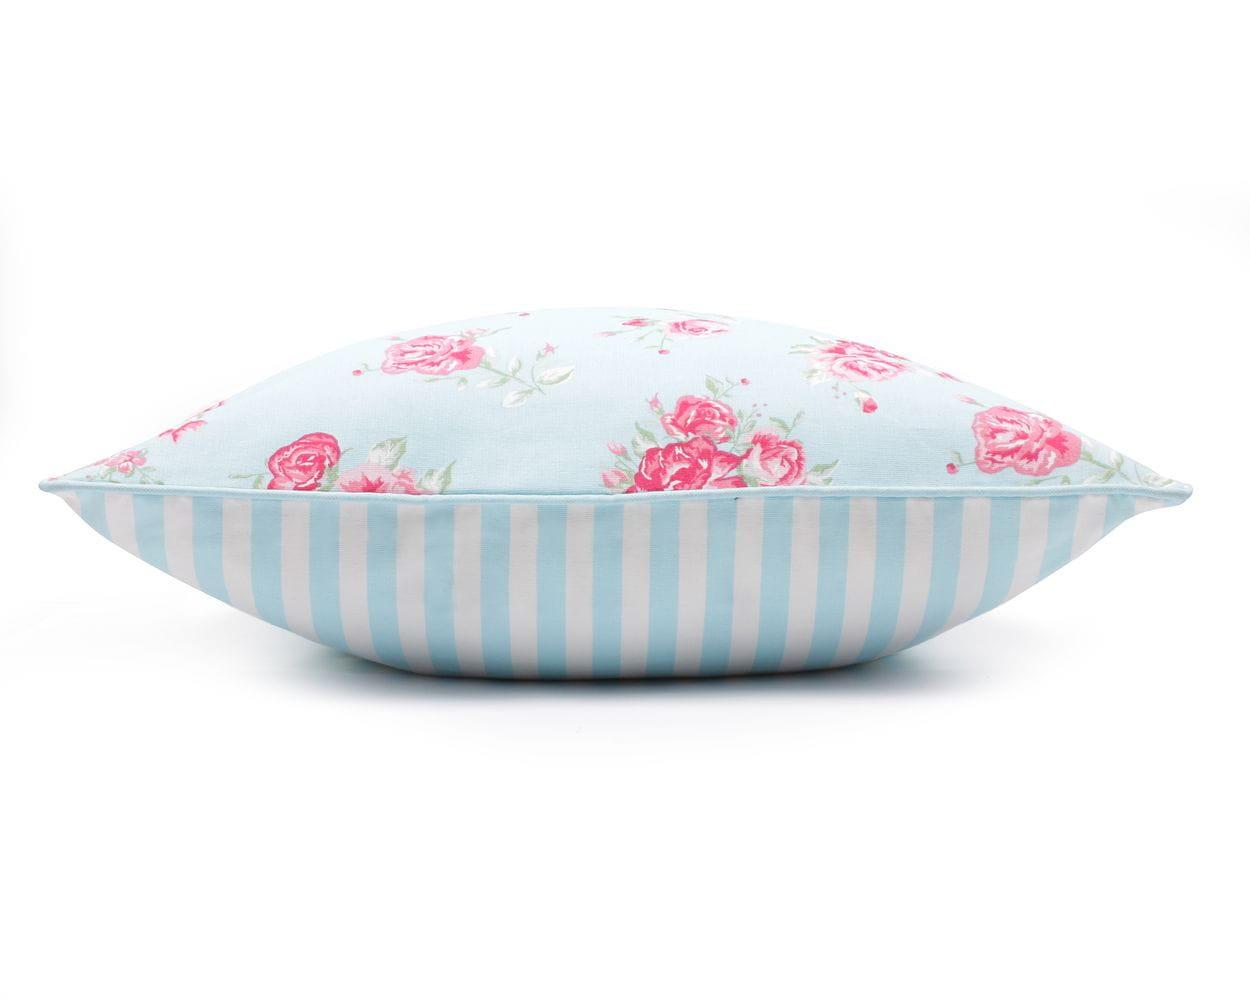 Poduszka dekoracyjna Roses Blue 60x60 cm - We Love Candles&We Love Beds